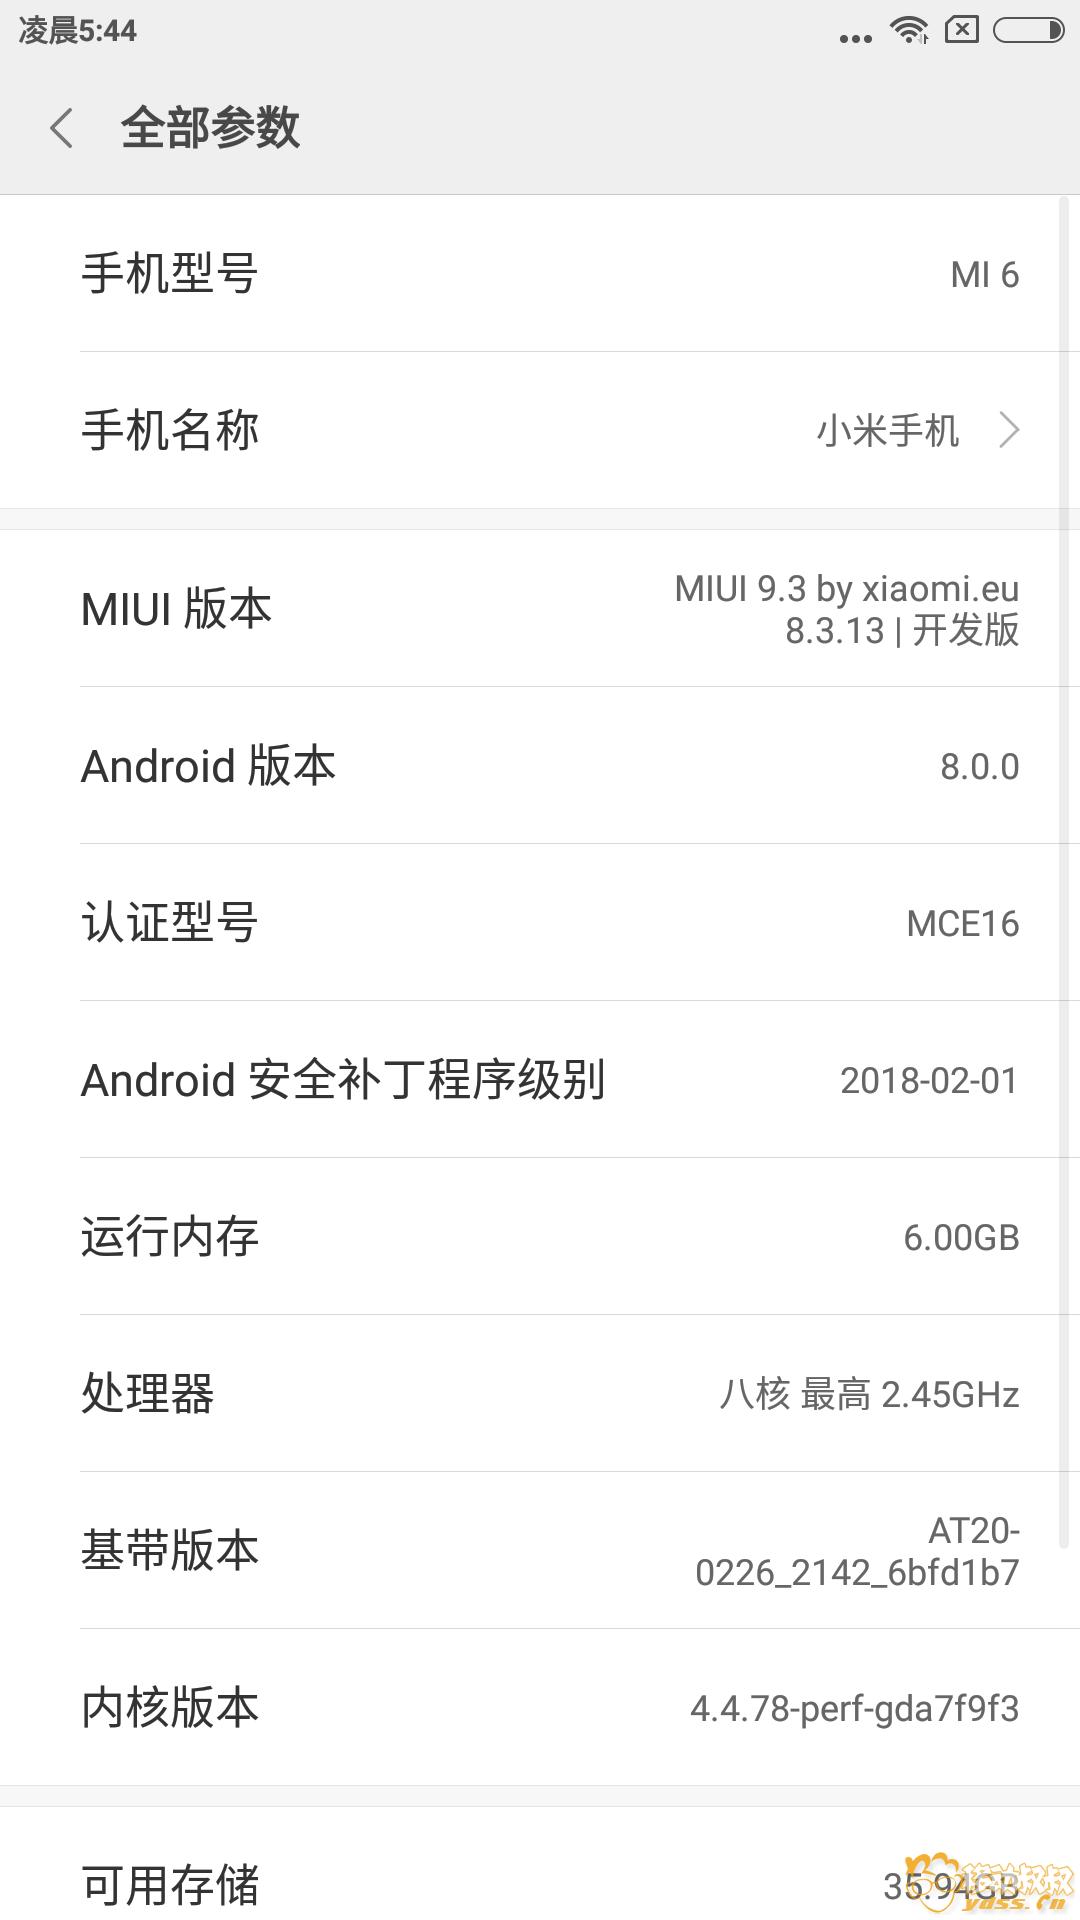 Screenshot_2018-03-13-05-44-36-503_com.android.se.png